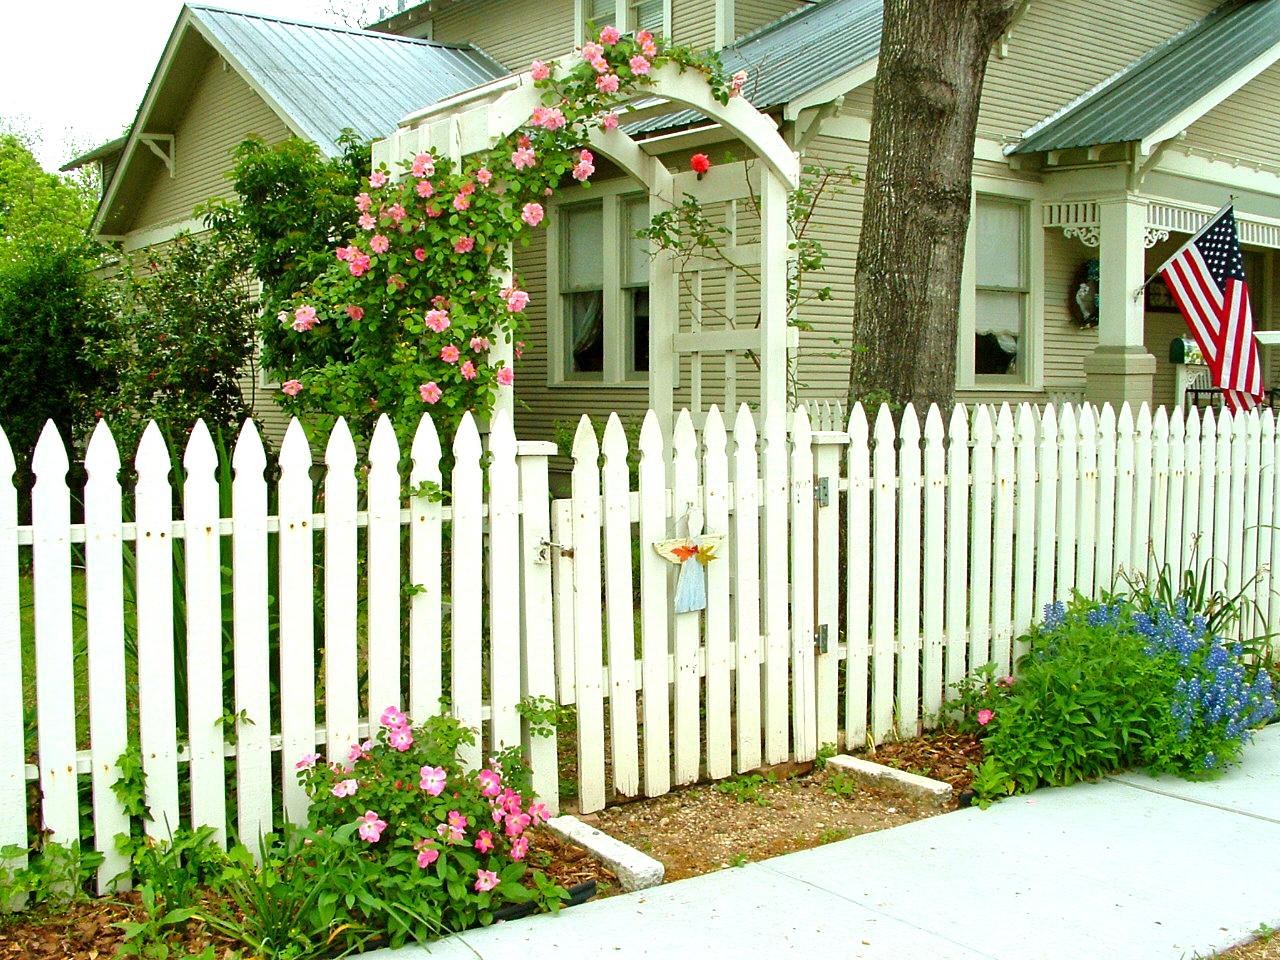 the brenham house white picket fences in brenham texas. Black Bedroom Furniture Sets. Home Design Ideas